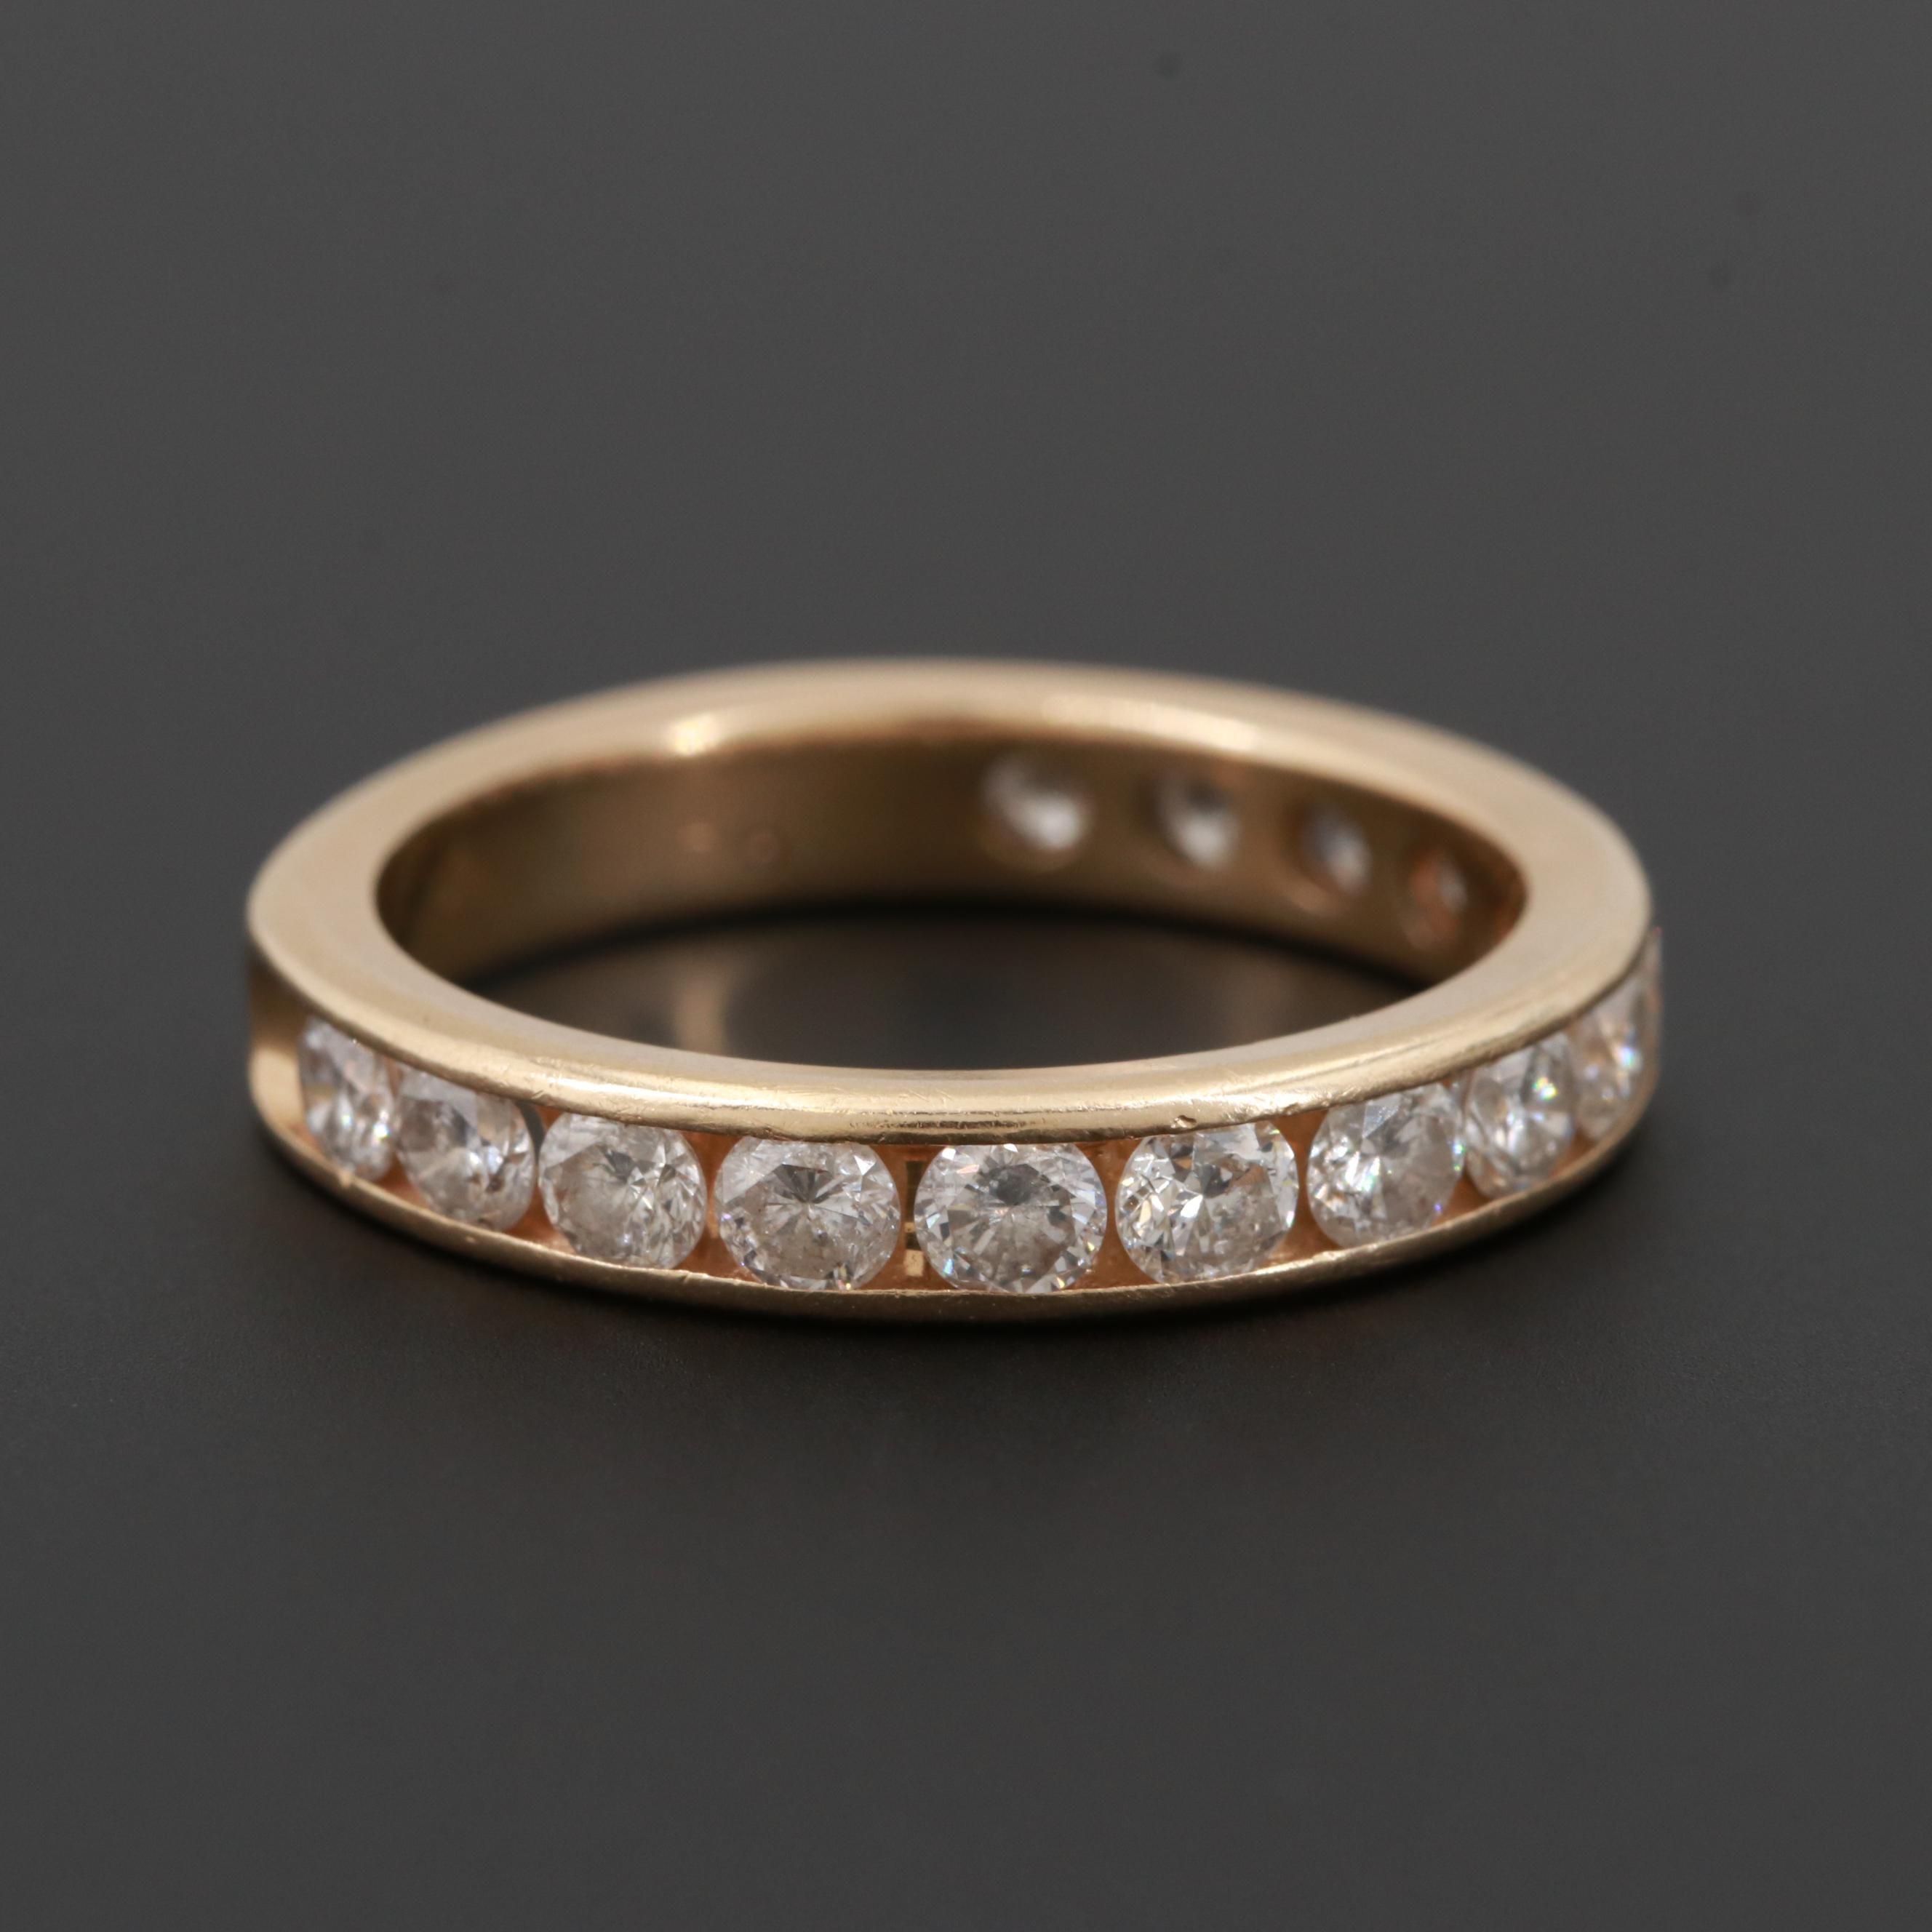 14K Yellow Gold 1.42 CTW Diamond Ring